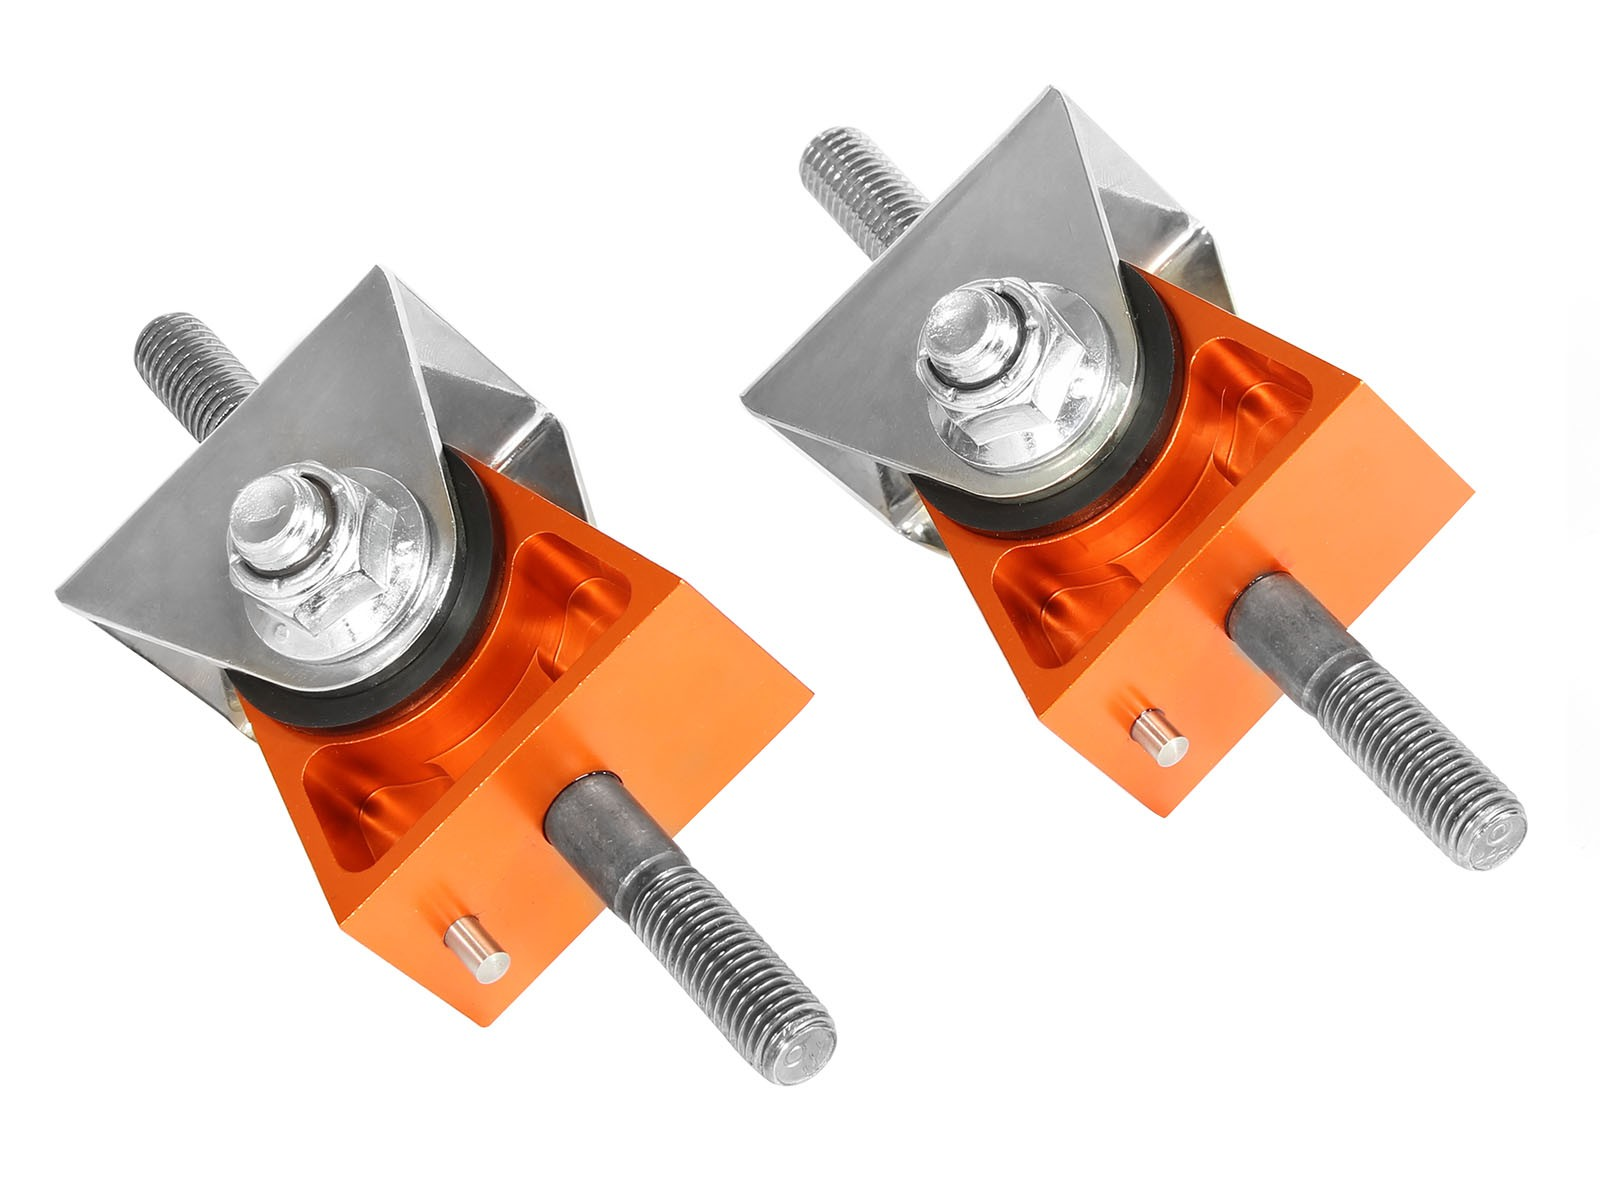 aFe POWER 450-401007-N aFe Control PFADT Series Engine Mount Set